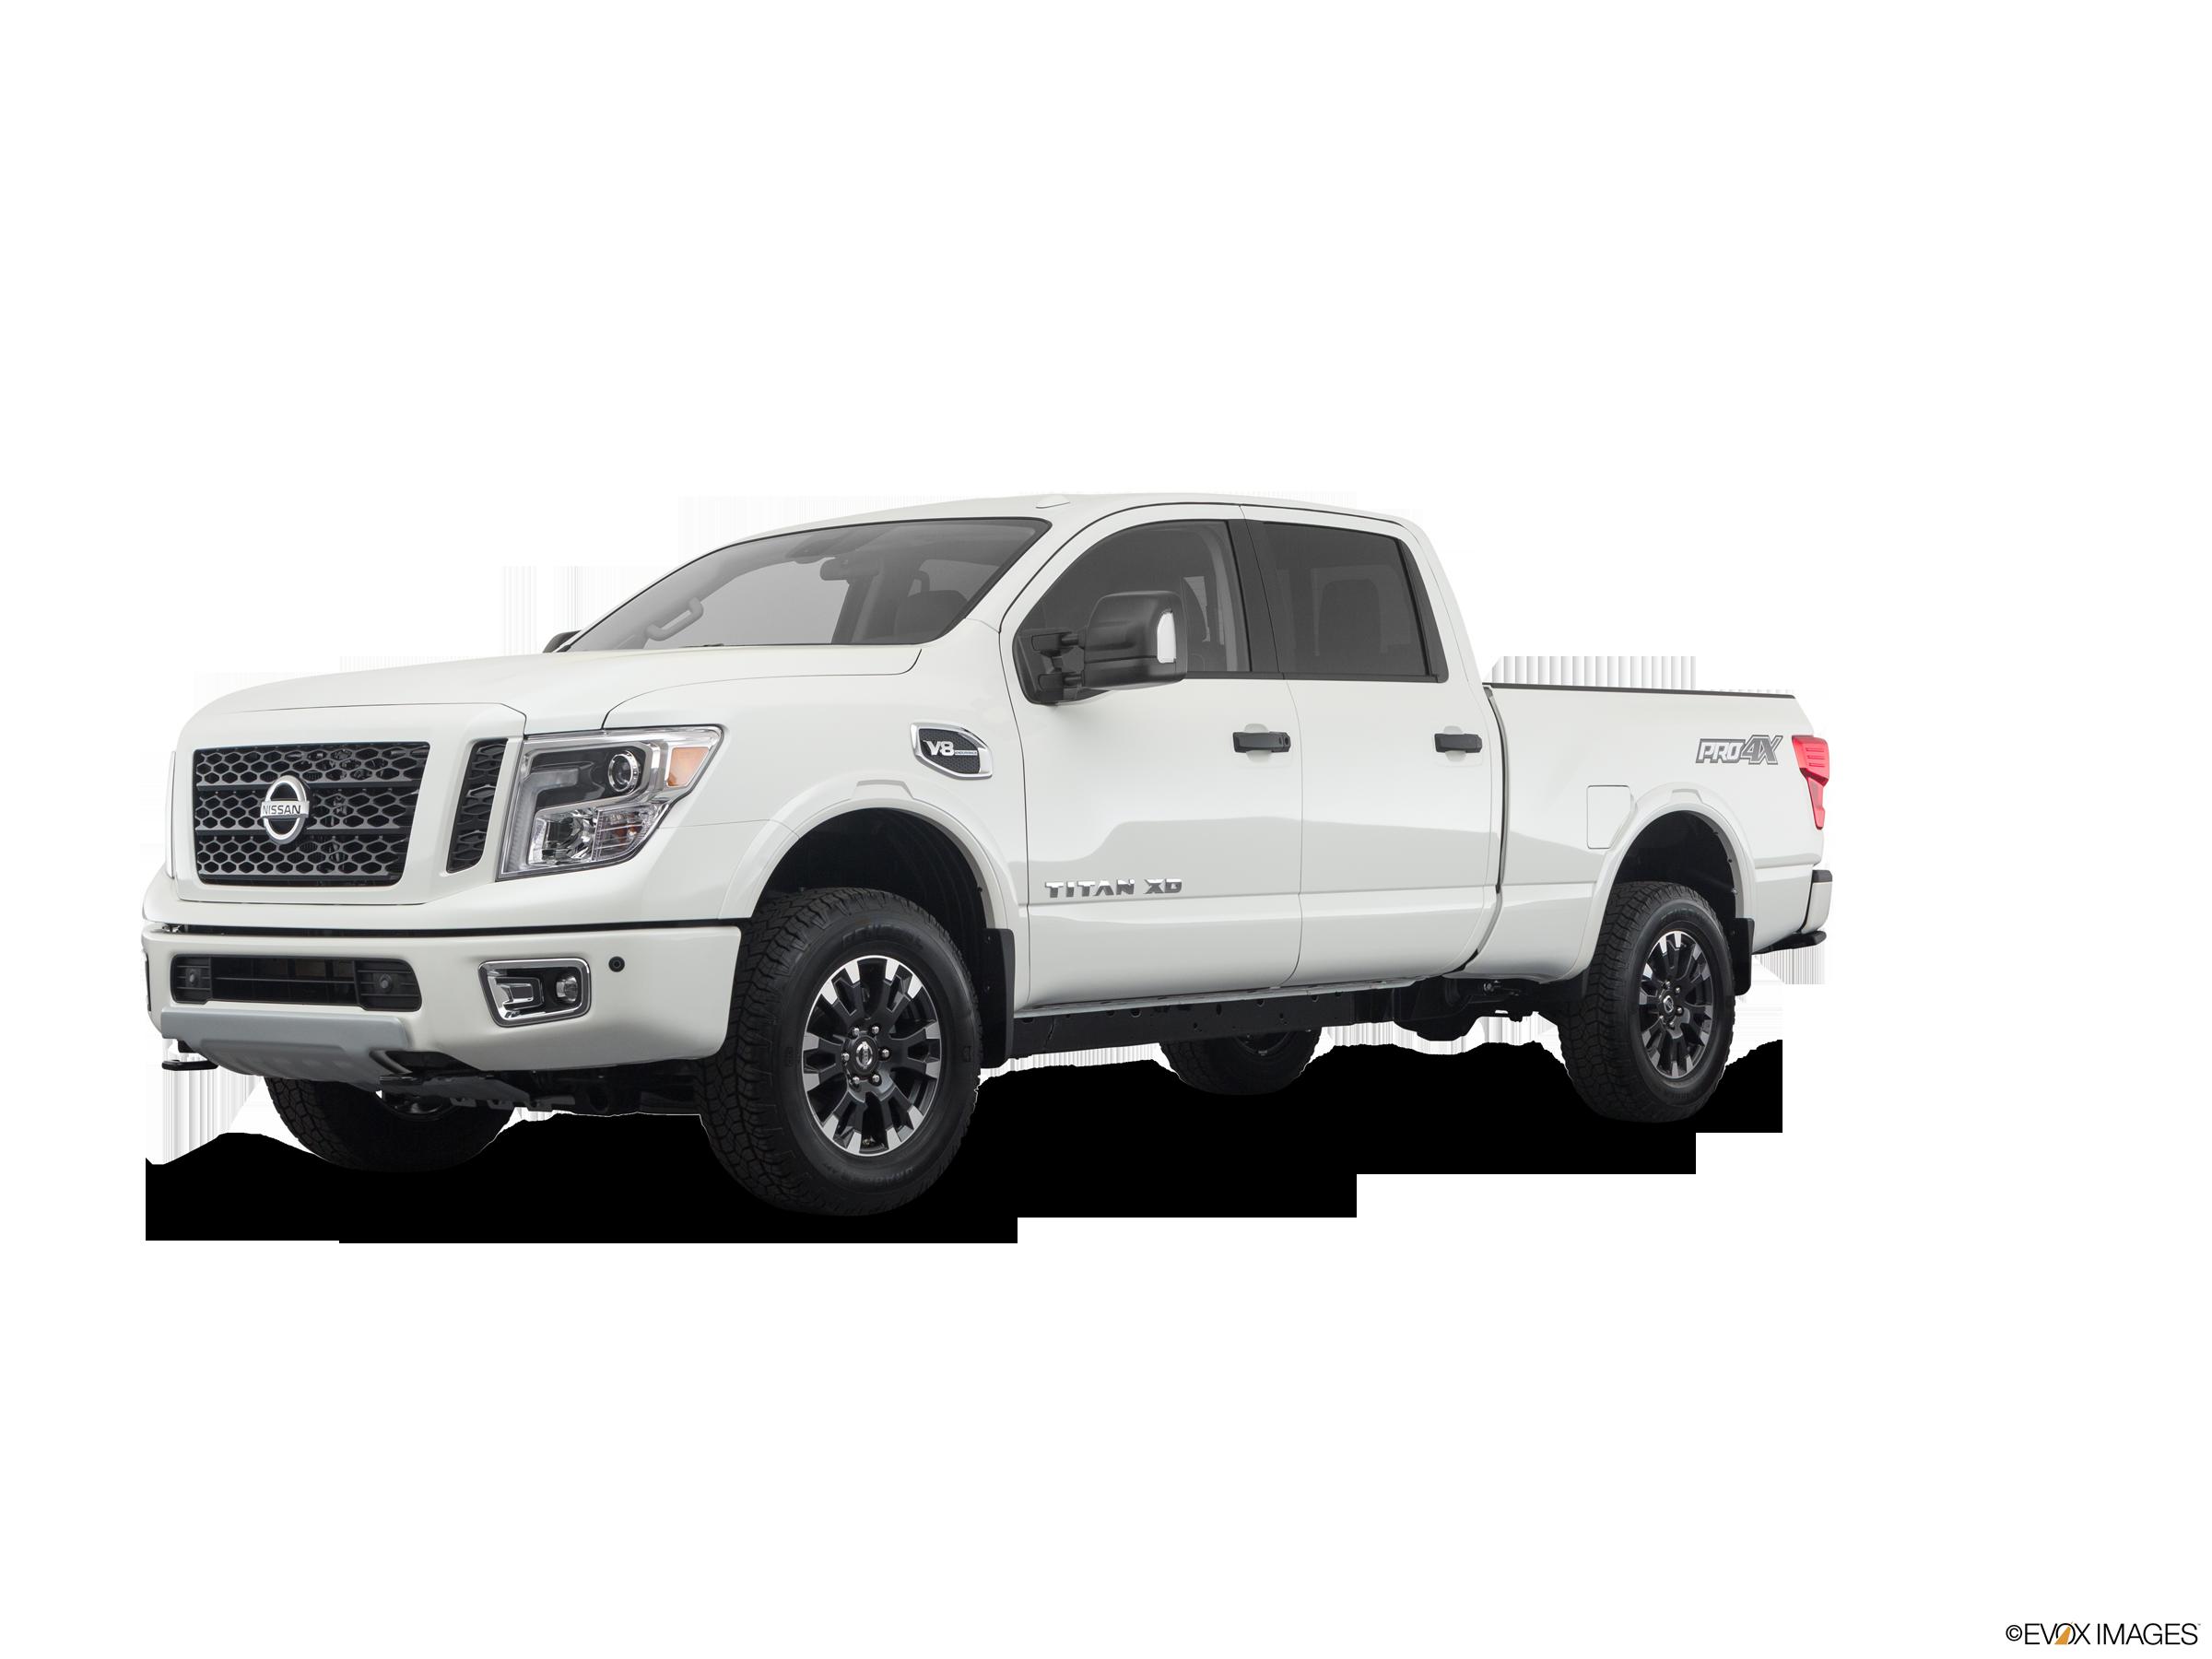 2019 Nissan TITAN XD Crew Cab | Pricing, Ratings, Expert Review